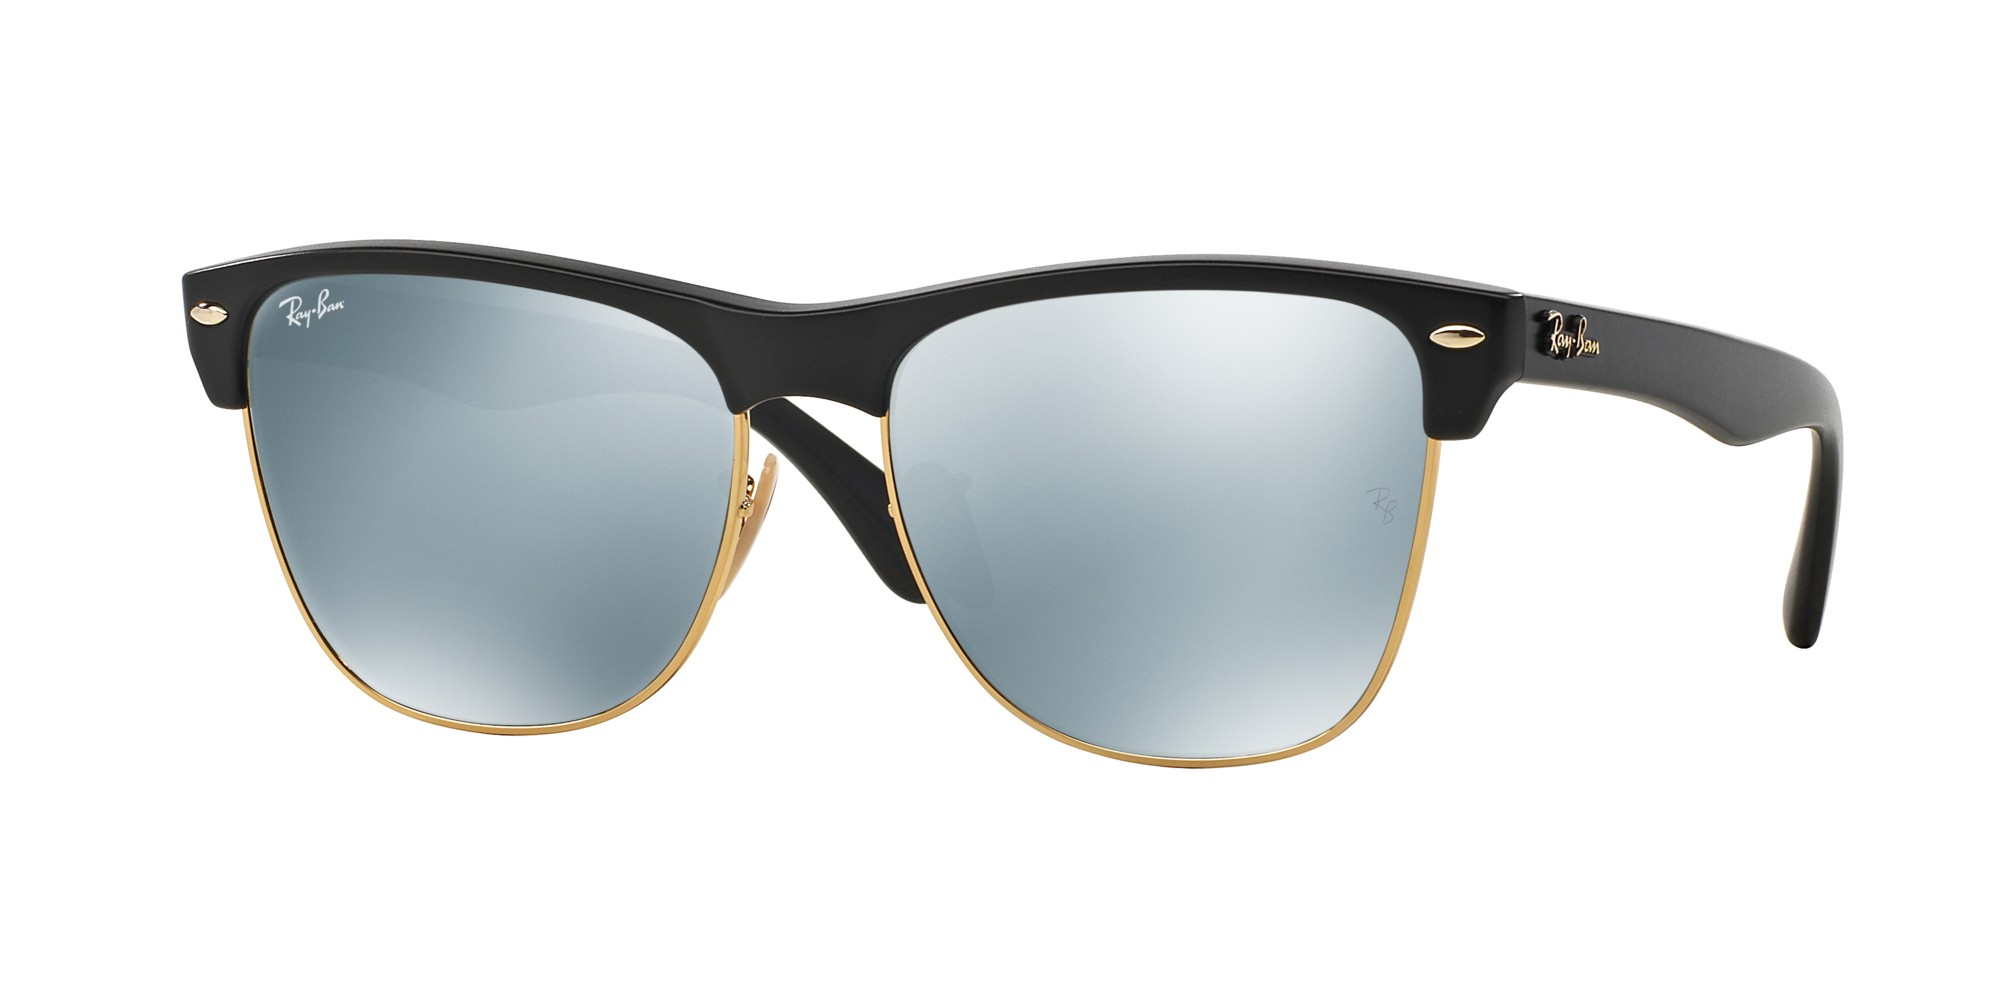 2b61630686f Authentic Ray-Ban Rb4175 Prescription Sunglasses